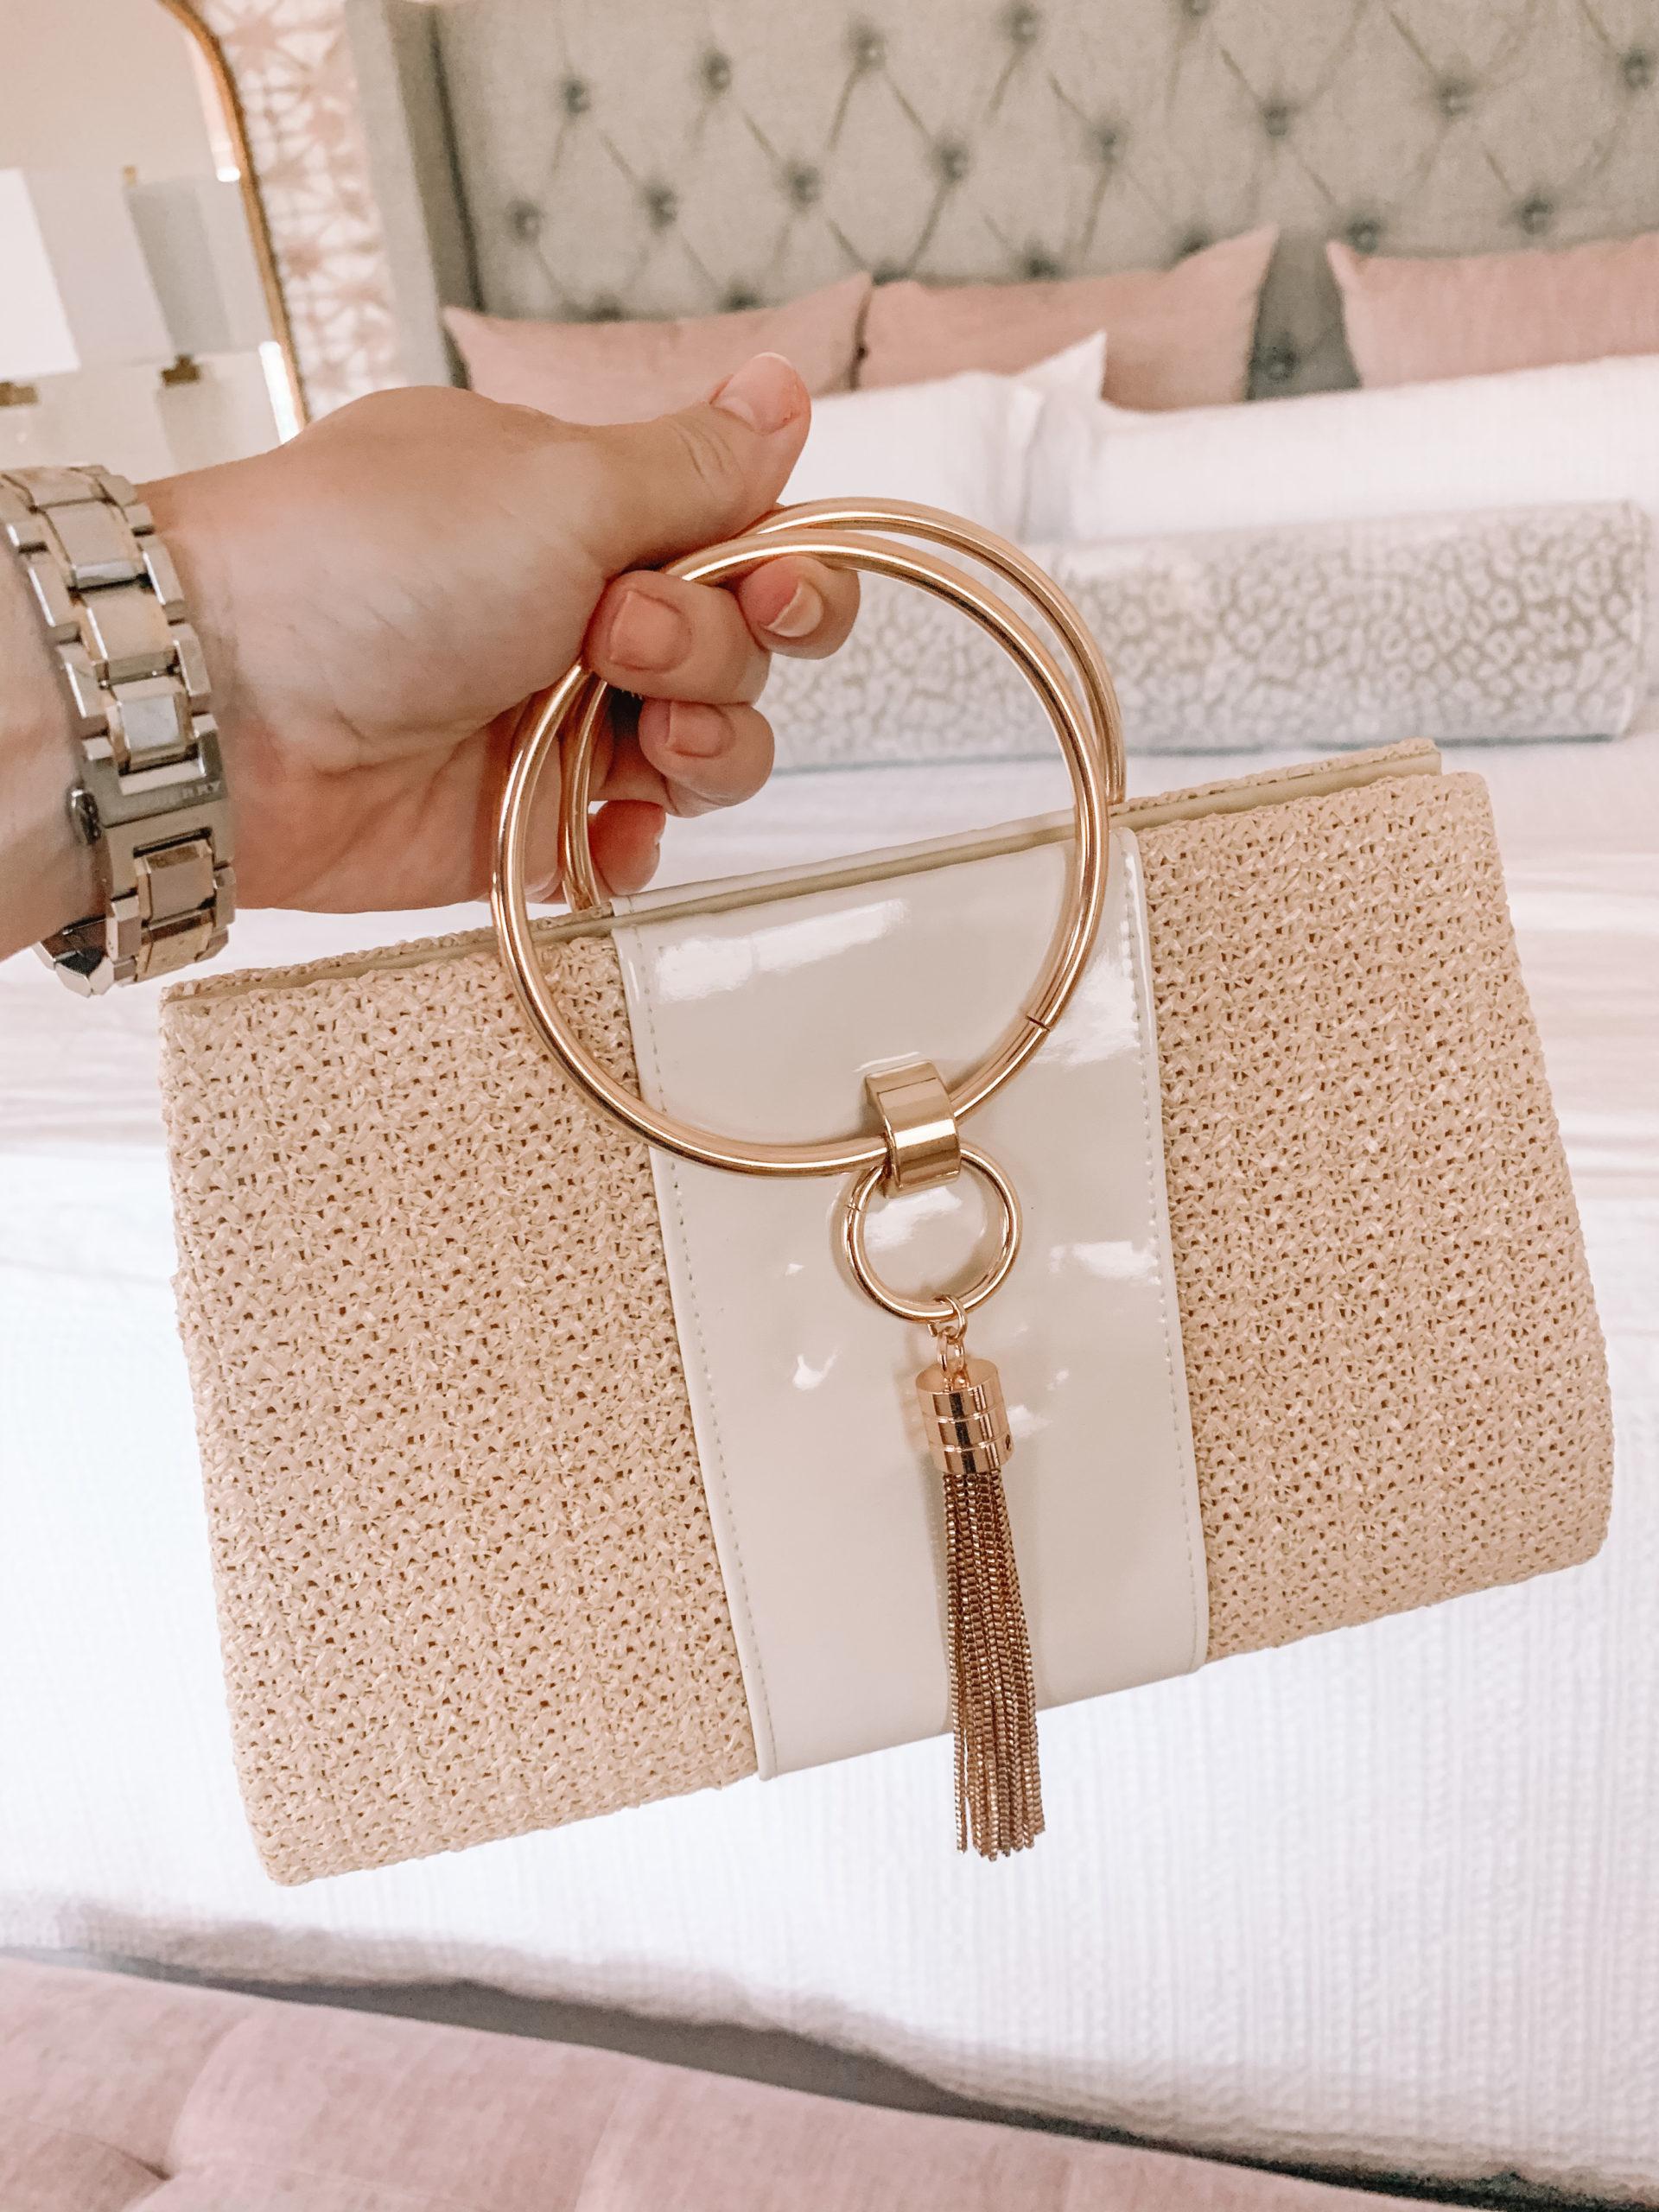 Amazon Fashion - Woven Bag